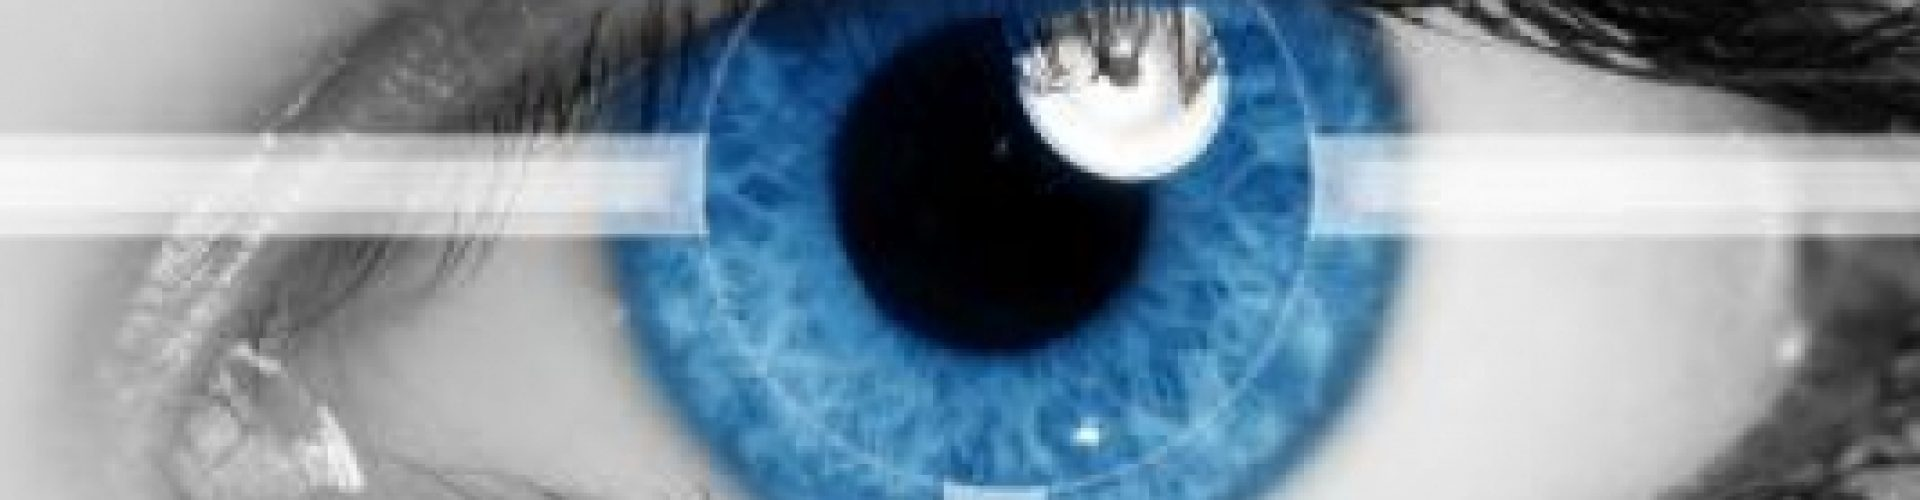 Cabinet d'ophtalmologie de GRANVILLE